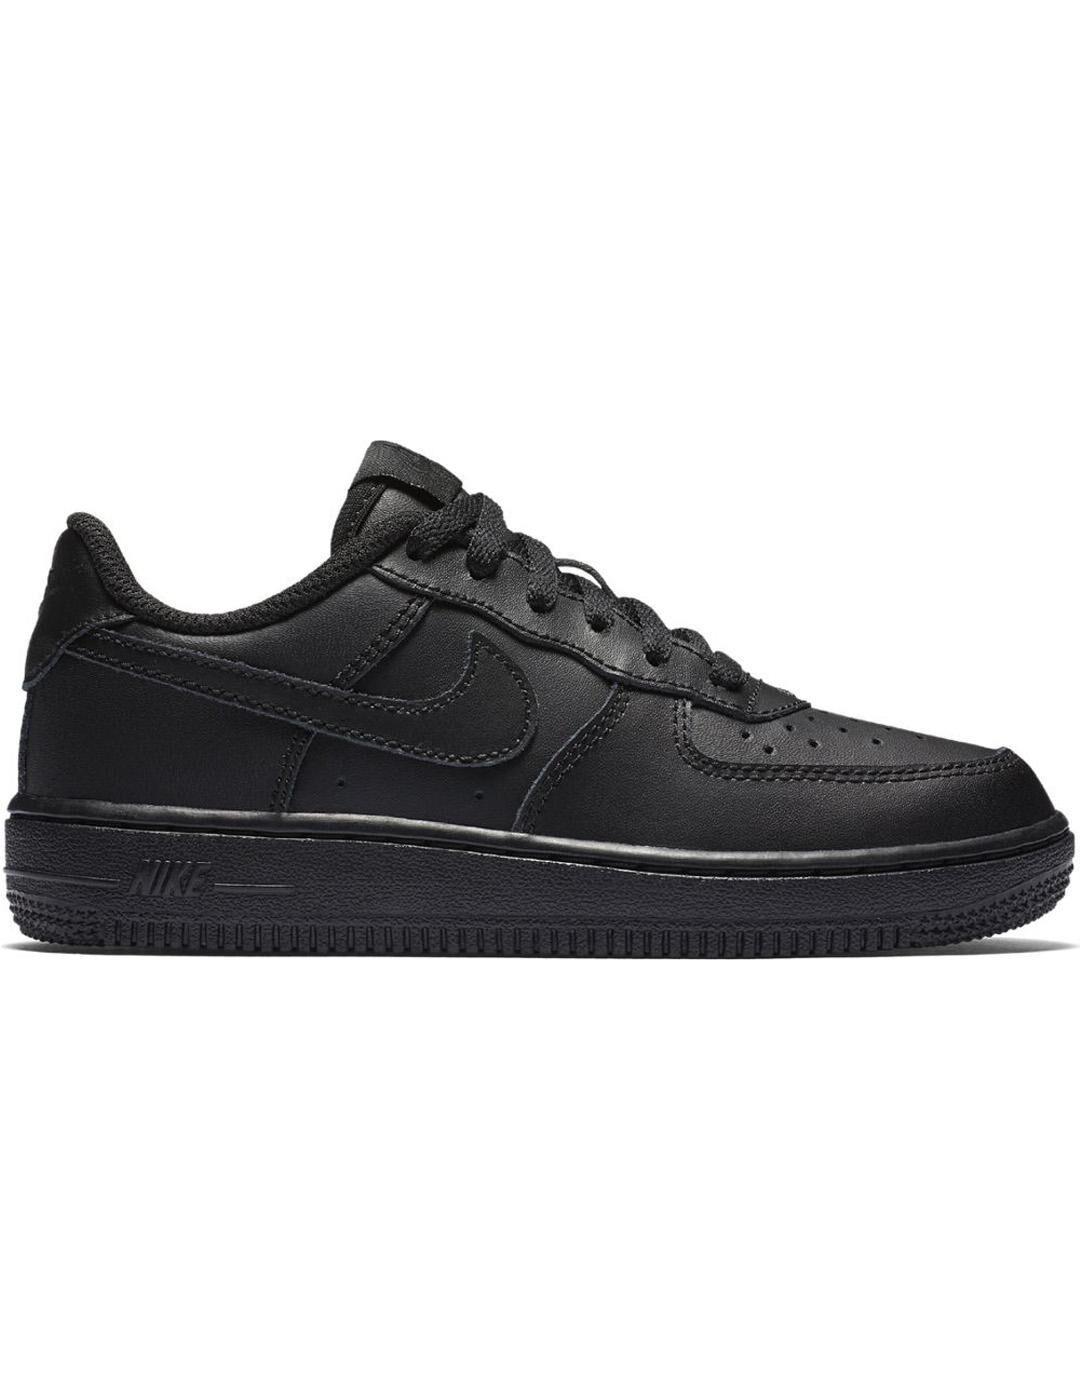 Nike Force 1 (Ps) Negro/negro Niño/a - 31